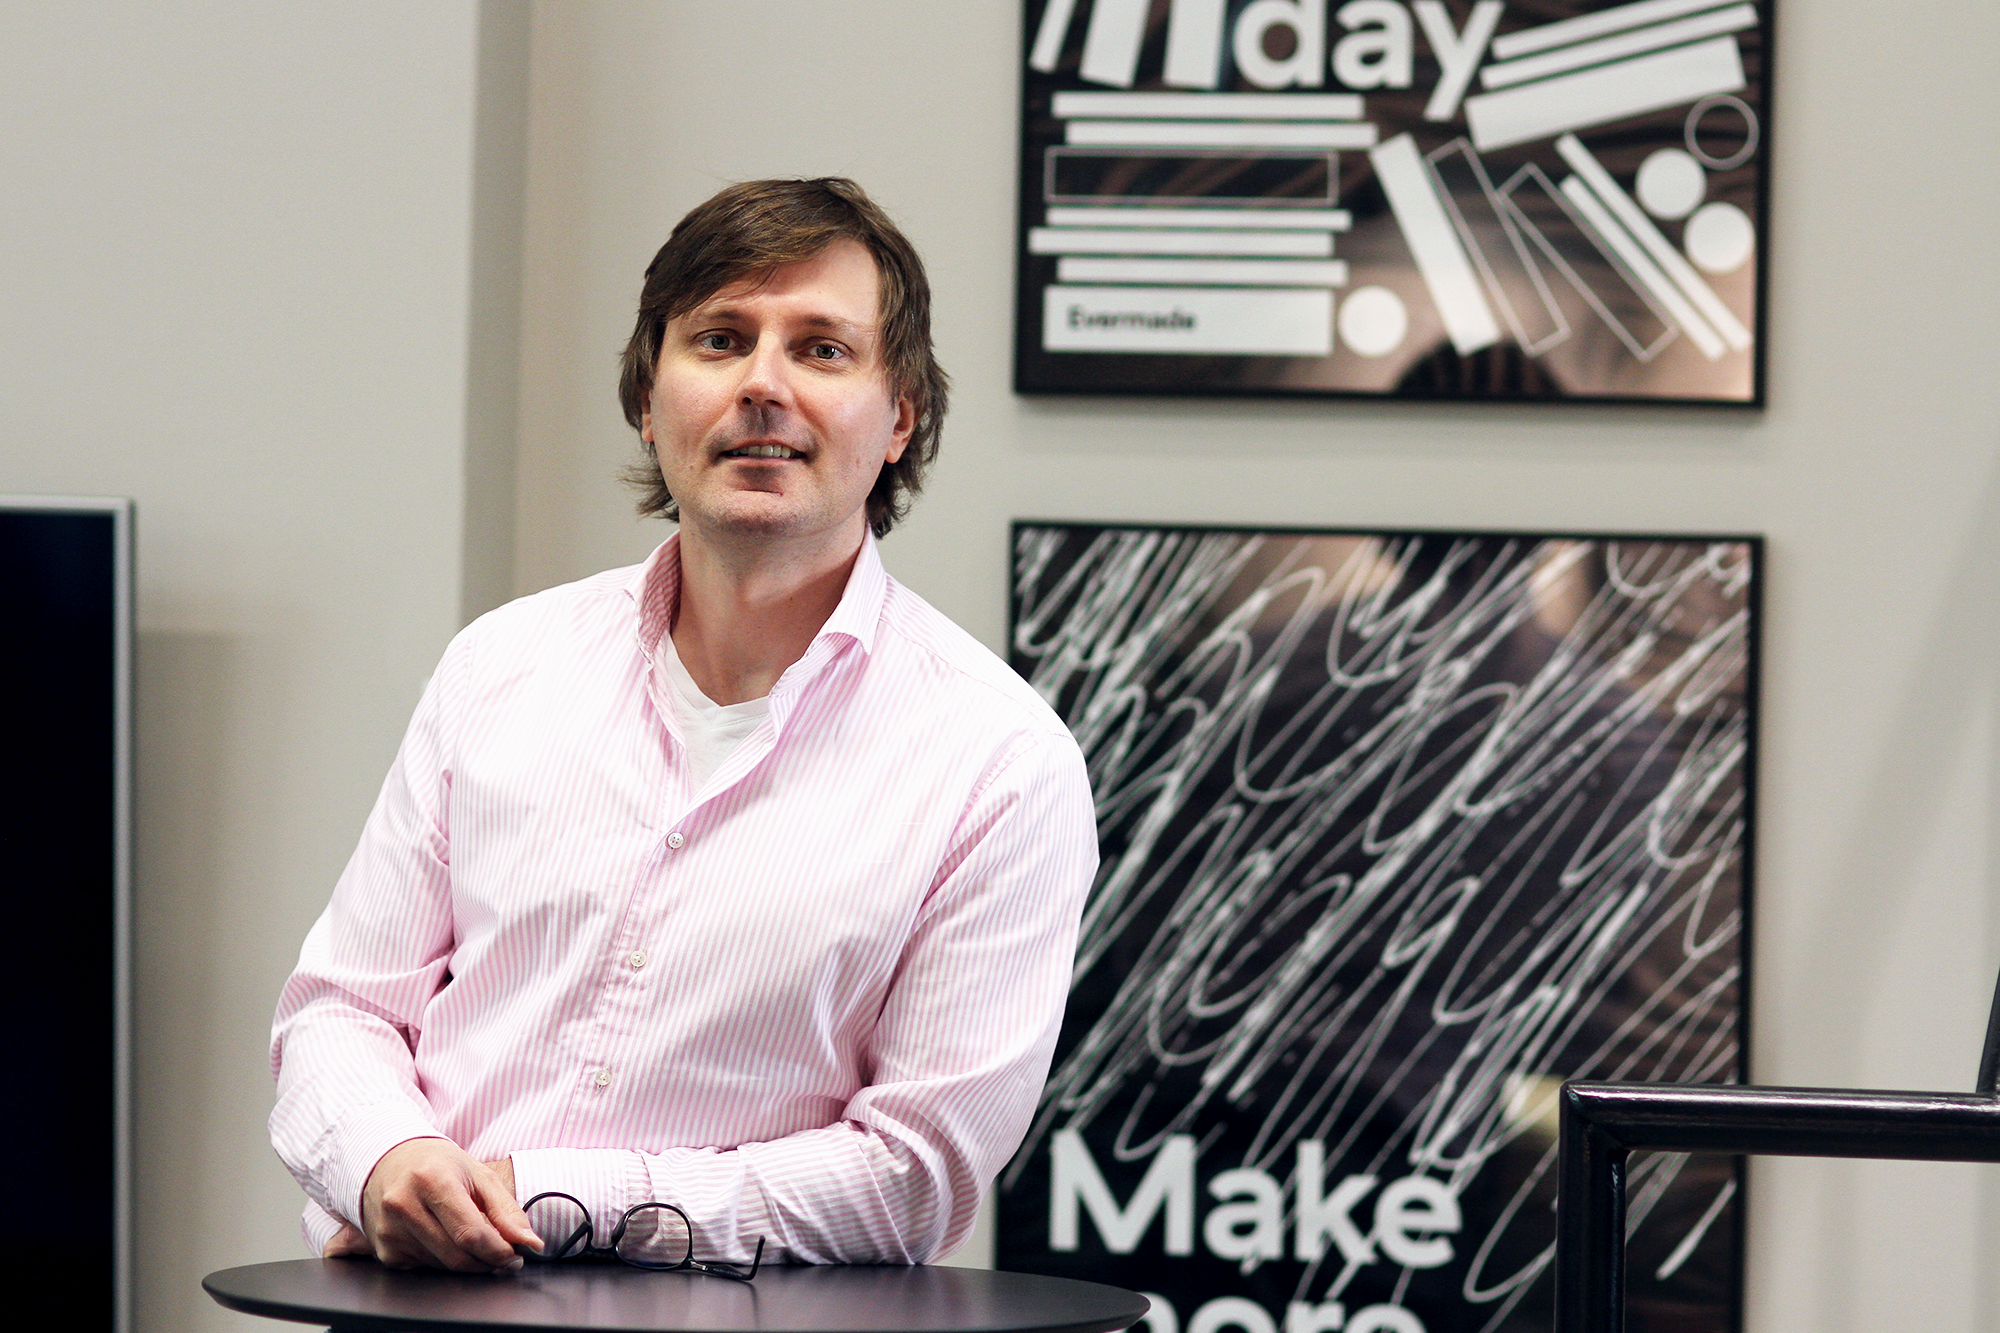 Sami Relander, CEO at Evermade